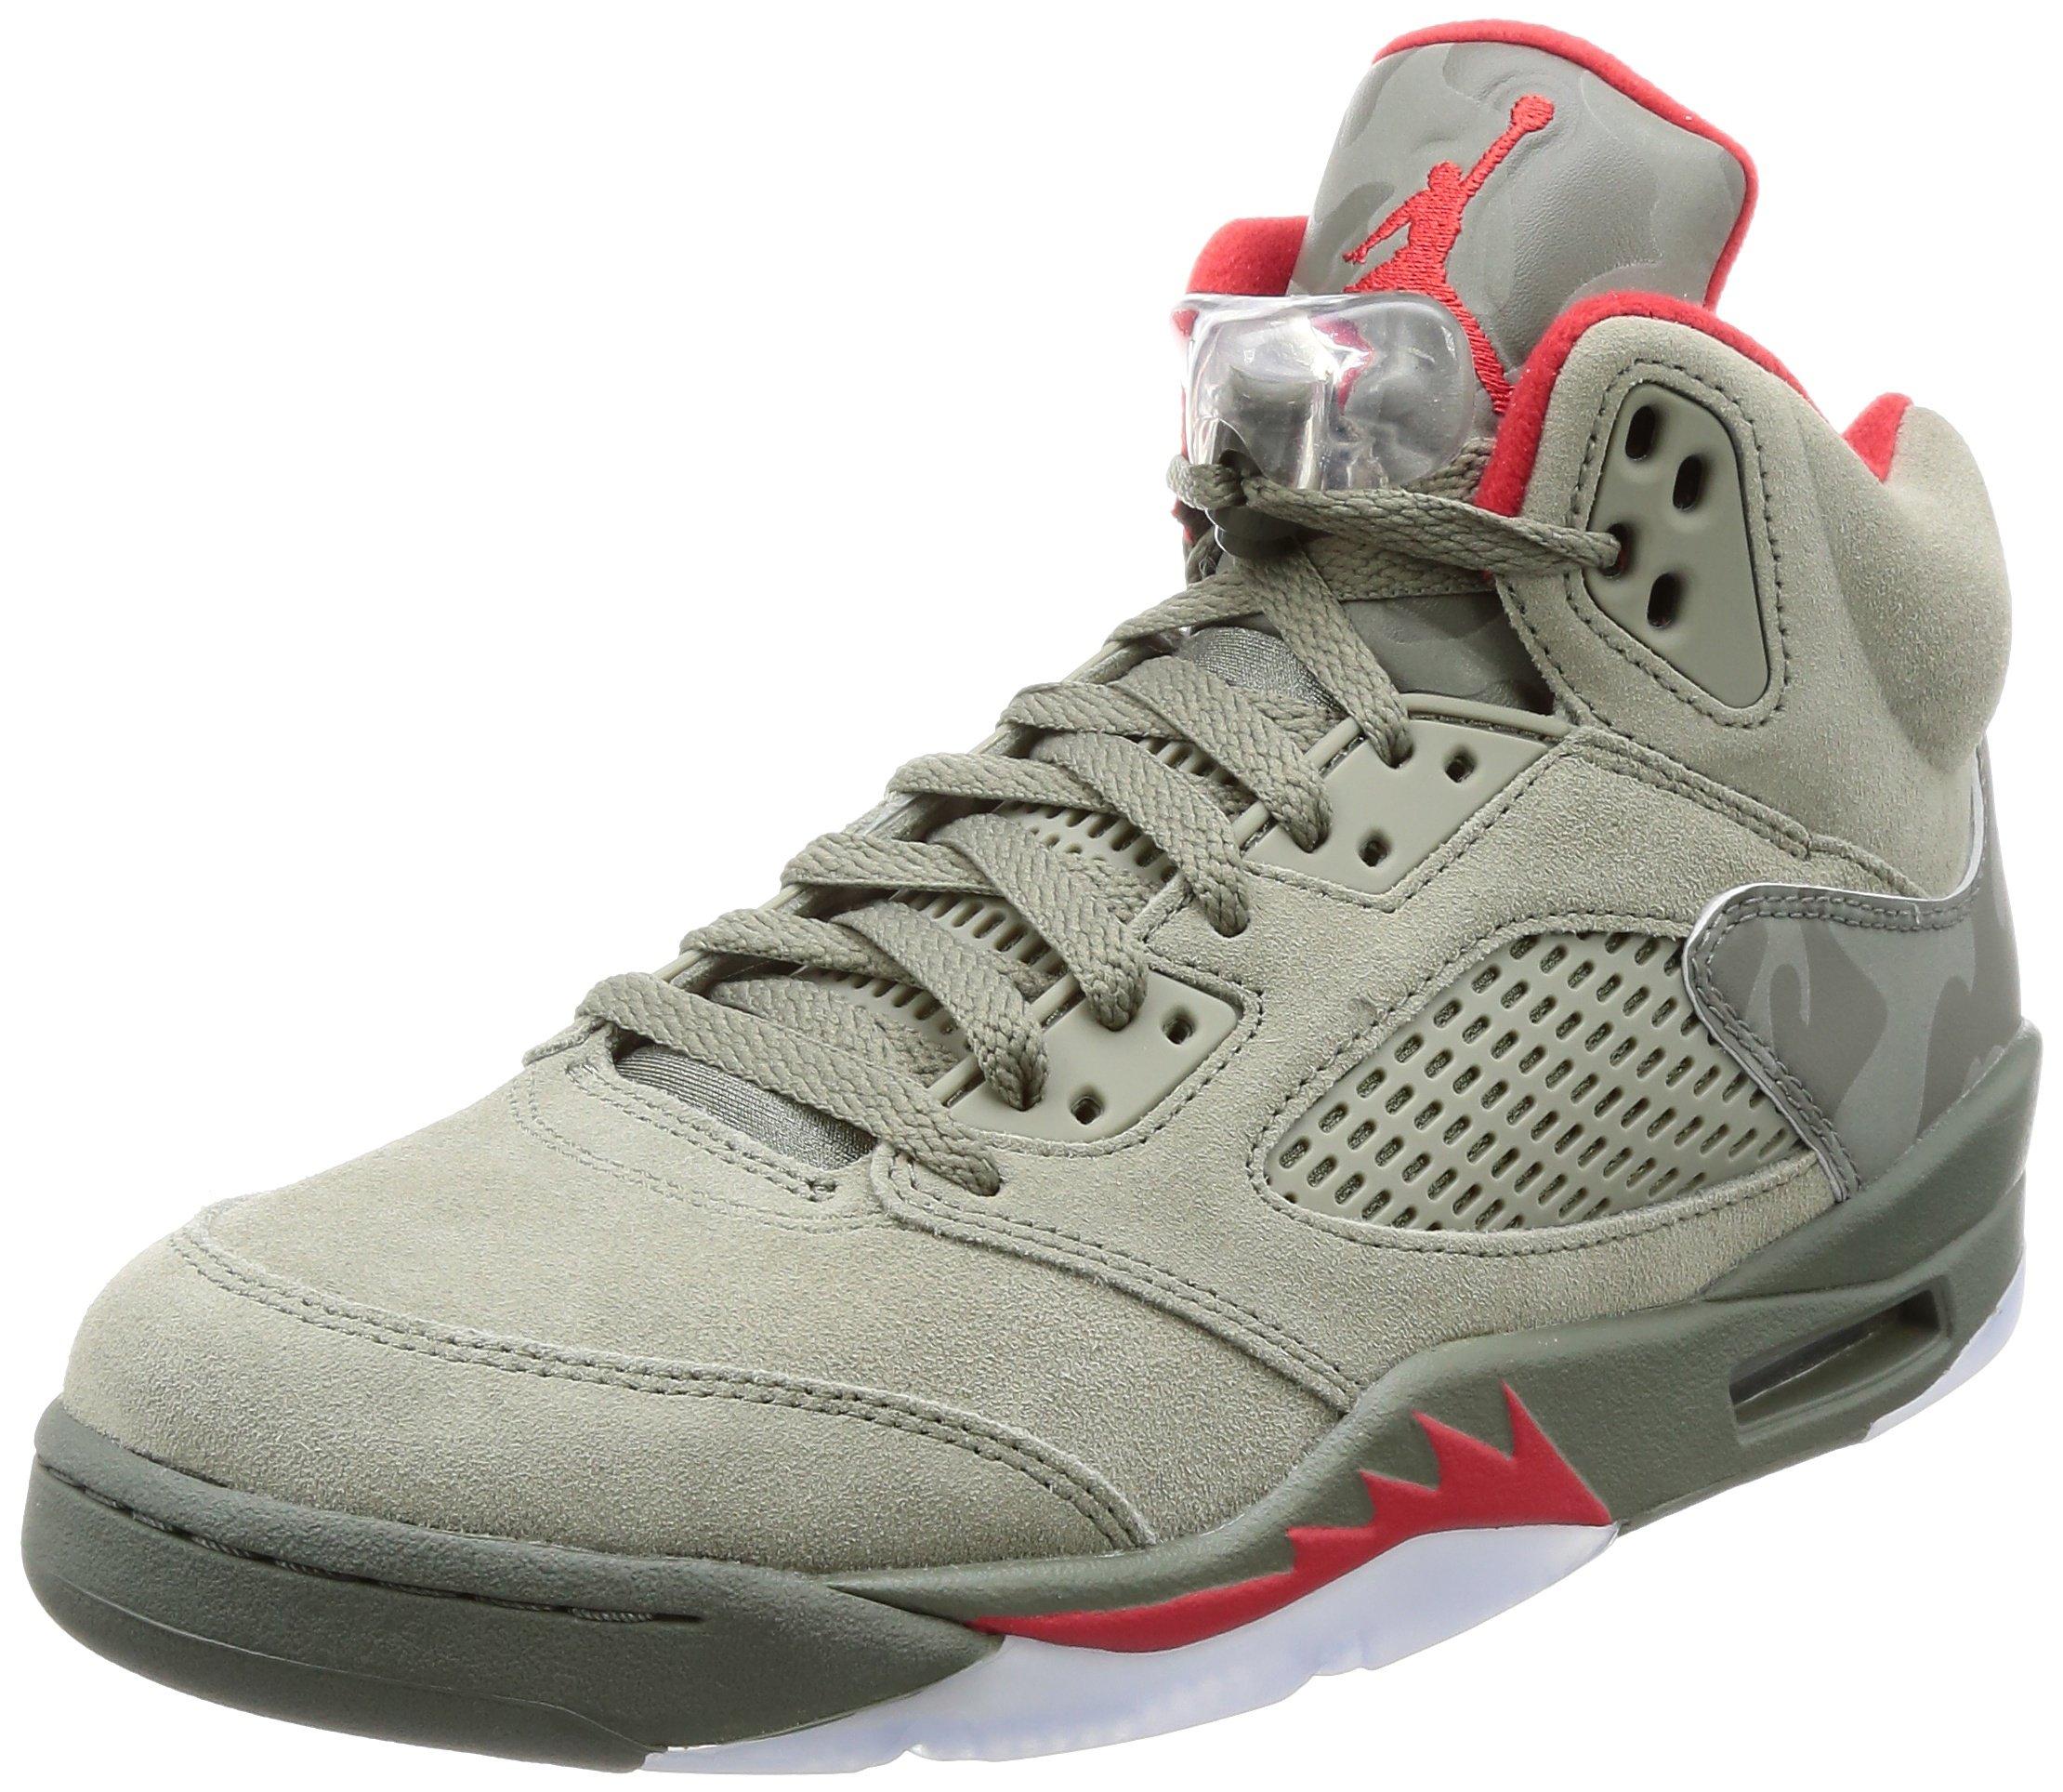 Air Jordan 5 Retro Reflective Camo casual sneakers mens dark stucco/university red NEW 136027-051 - 11